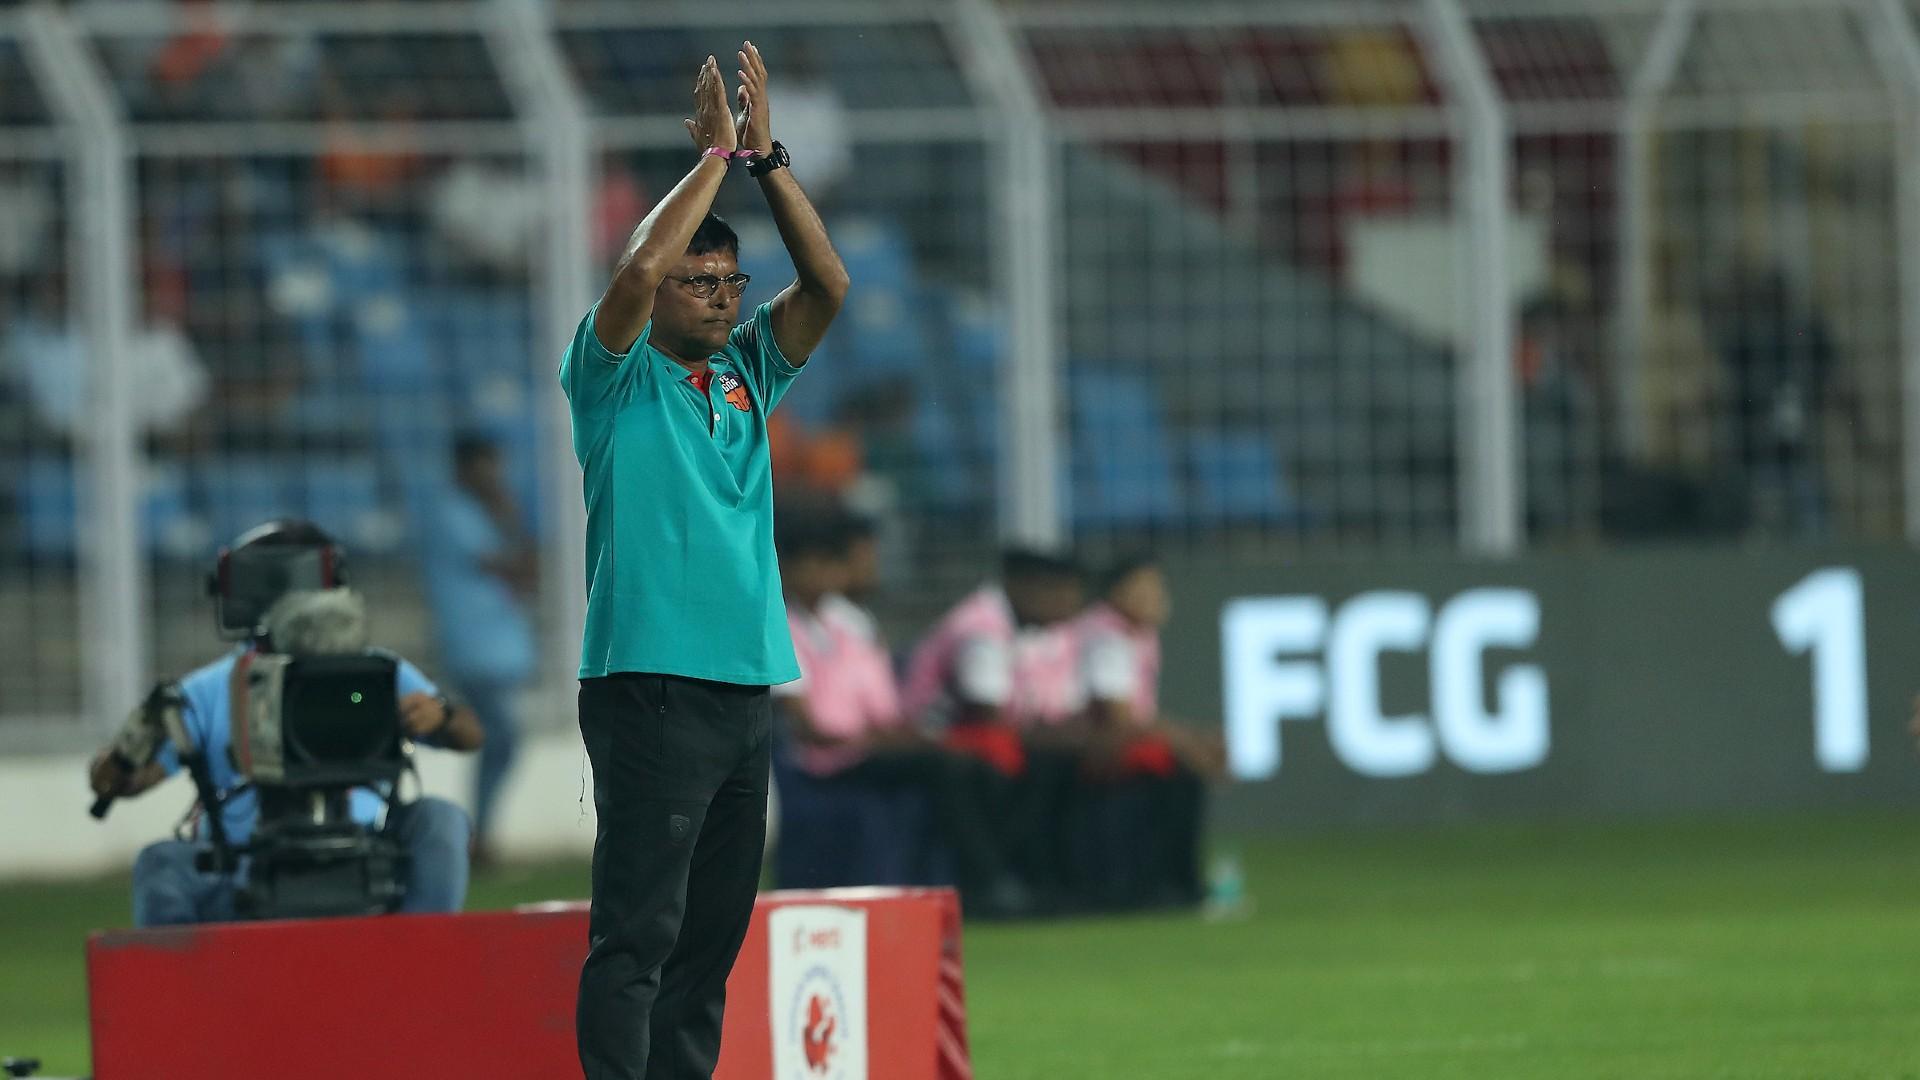 FC goa vs Hyderabad FC